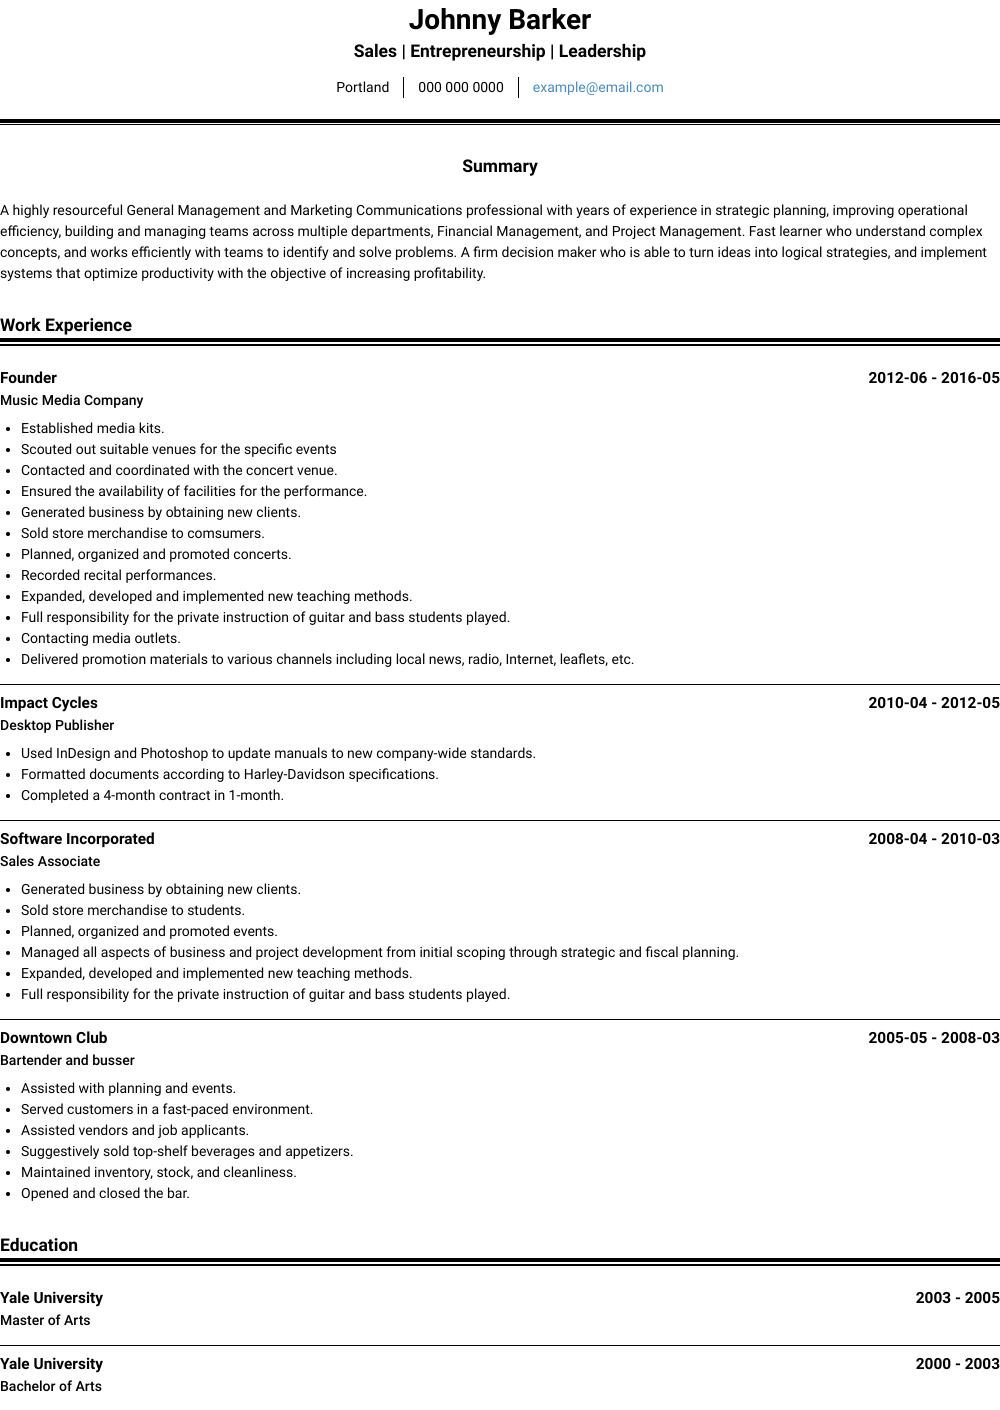 Entrepreneur Resume Sample and Template